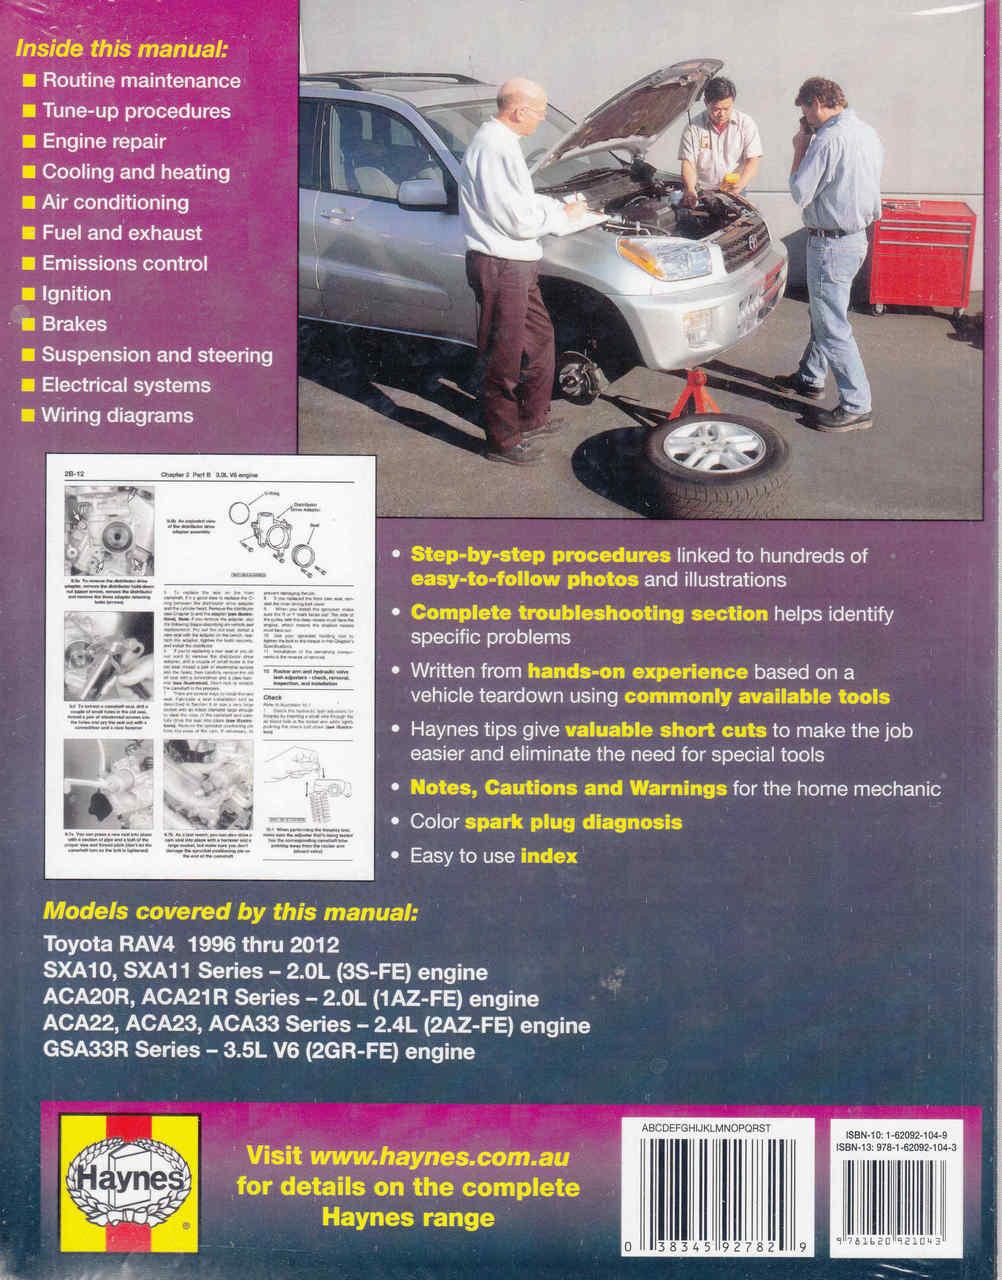 toyota rav4 1996 2012 workshop manual 9781620921043 back  [ 1002 x 1280 Pixel ]